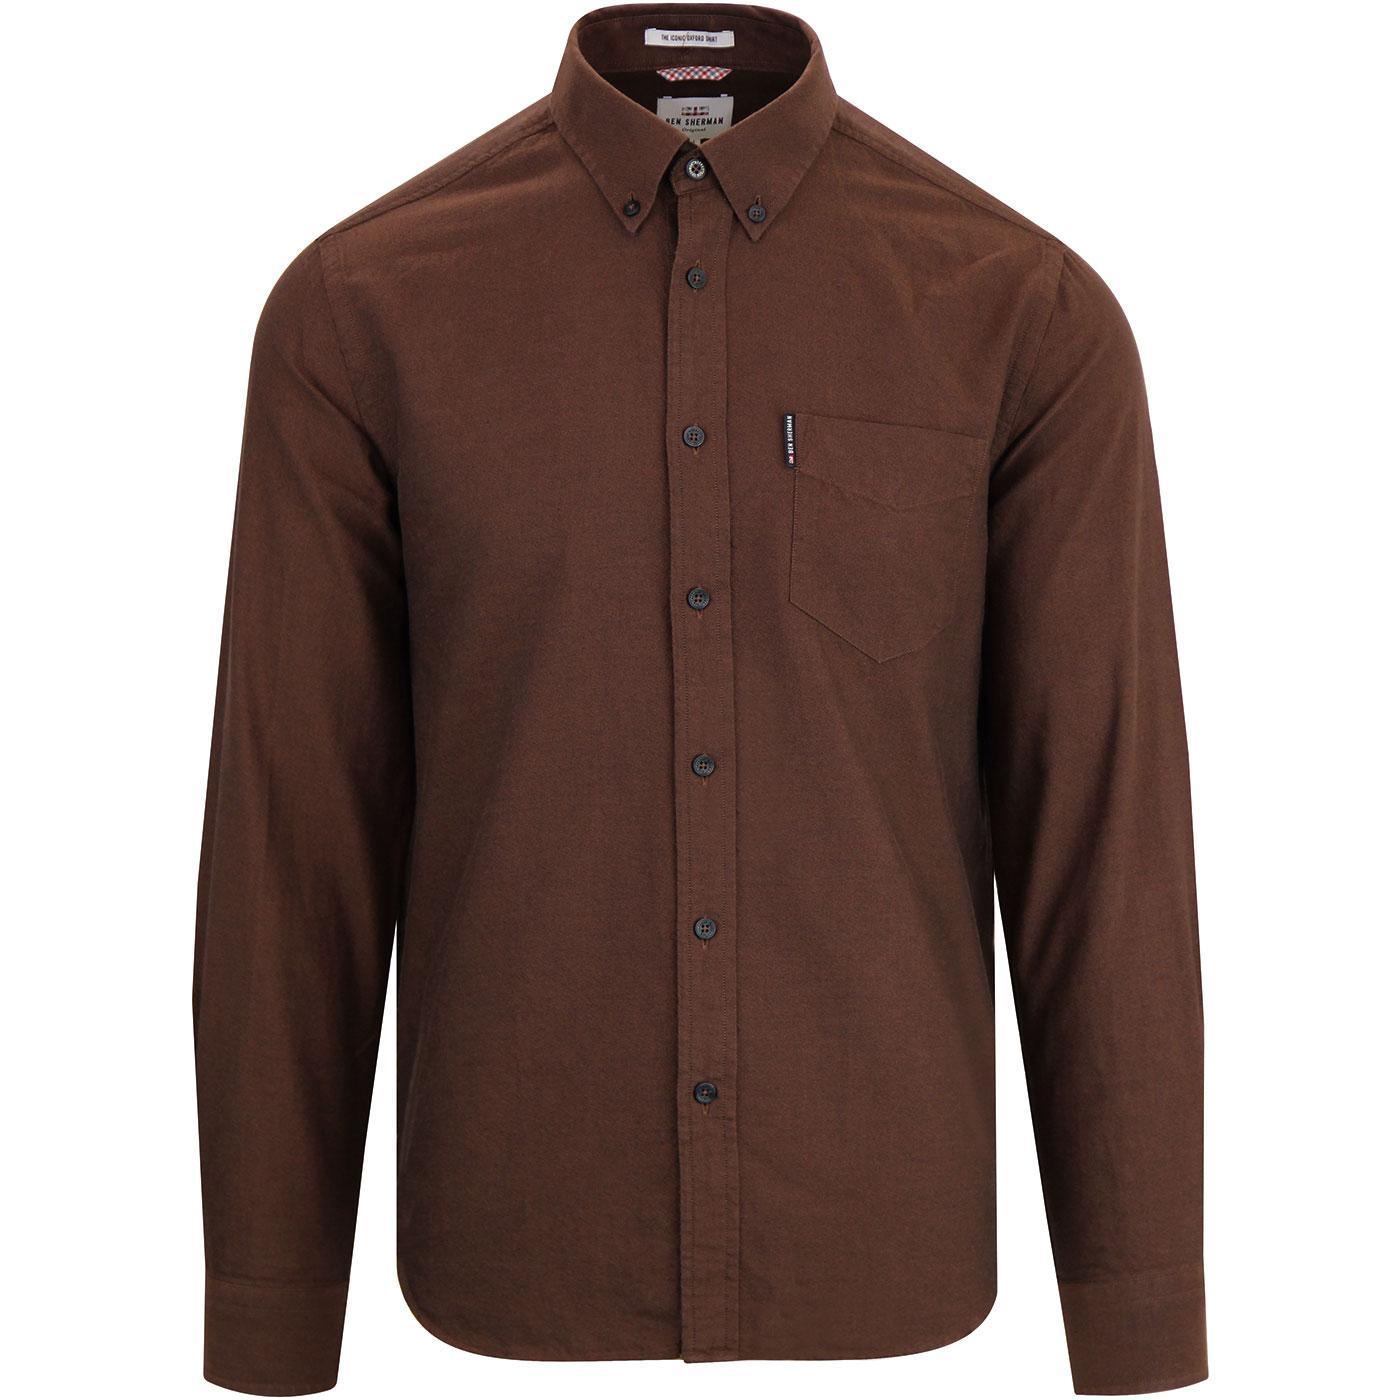 BEN SHERMAN Mod Button Down Oxford Shirt RUST